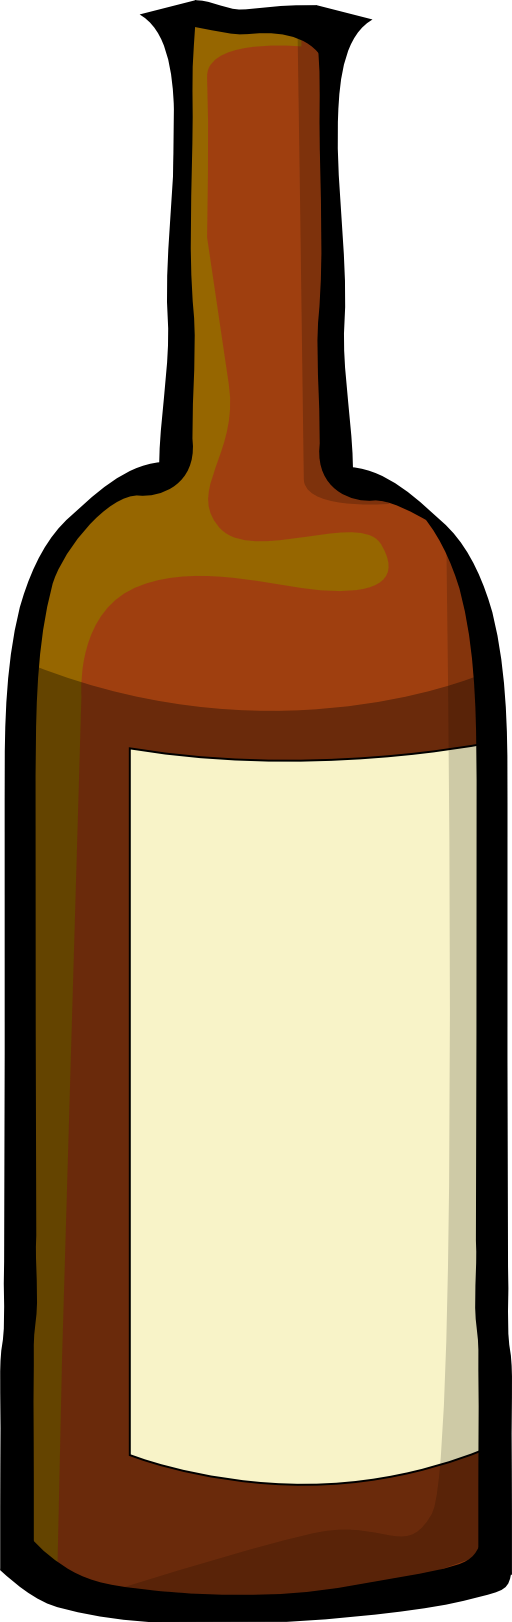 512x1622 Bottle Clipart, Suggestions For Bottle Clipart, Download Bottle